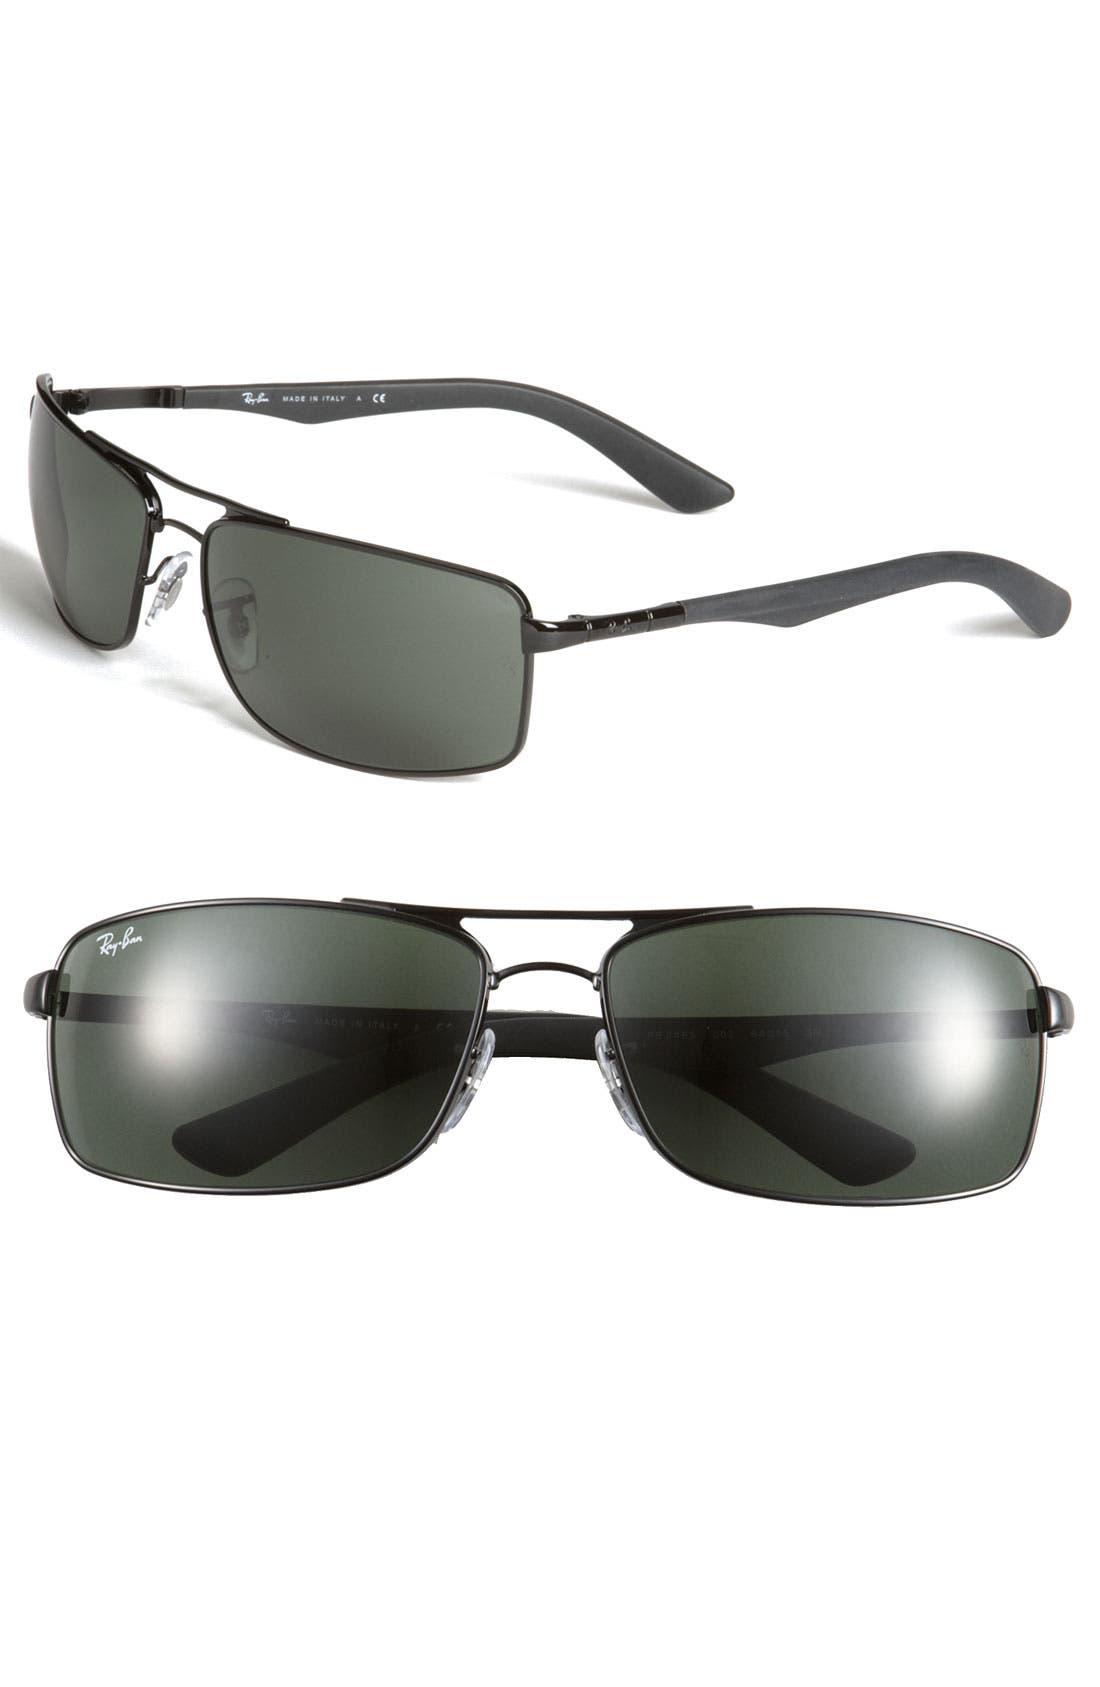 Double Bridge 64mm Rectangular Sunglasses,                             Main thumbnail 1, color,                             001